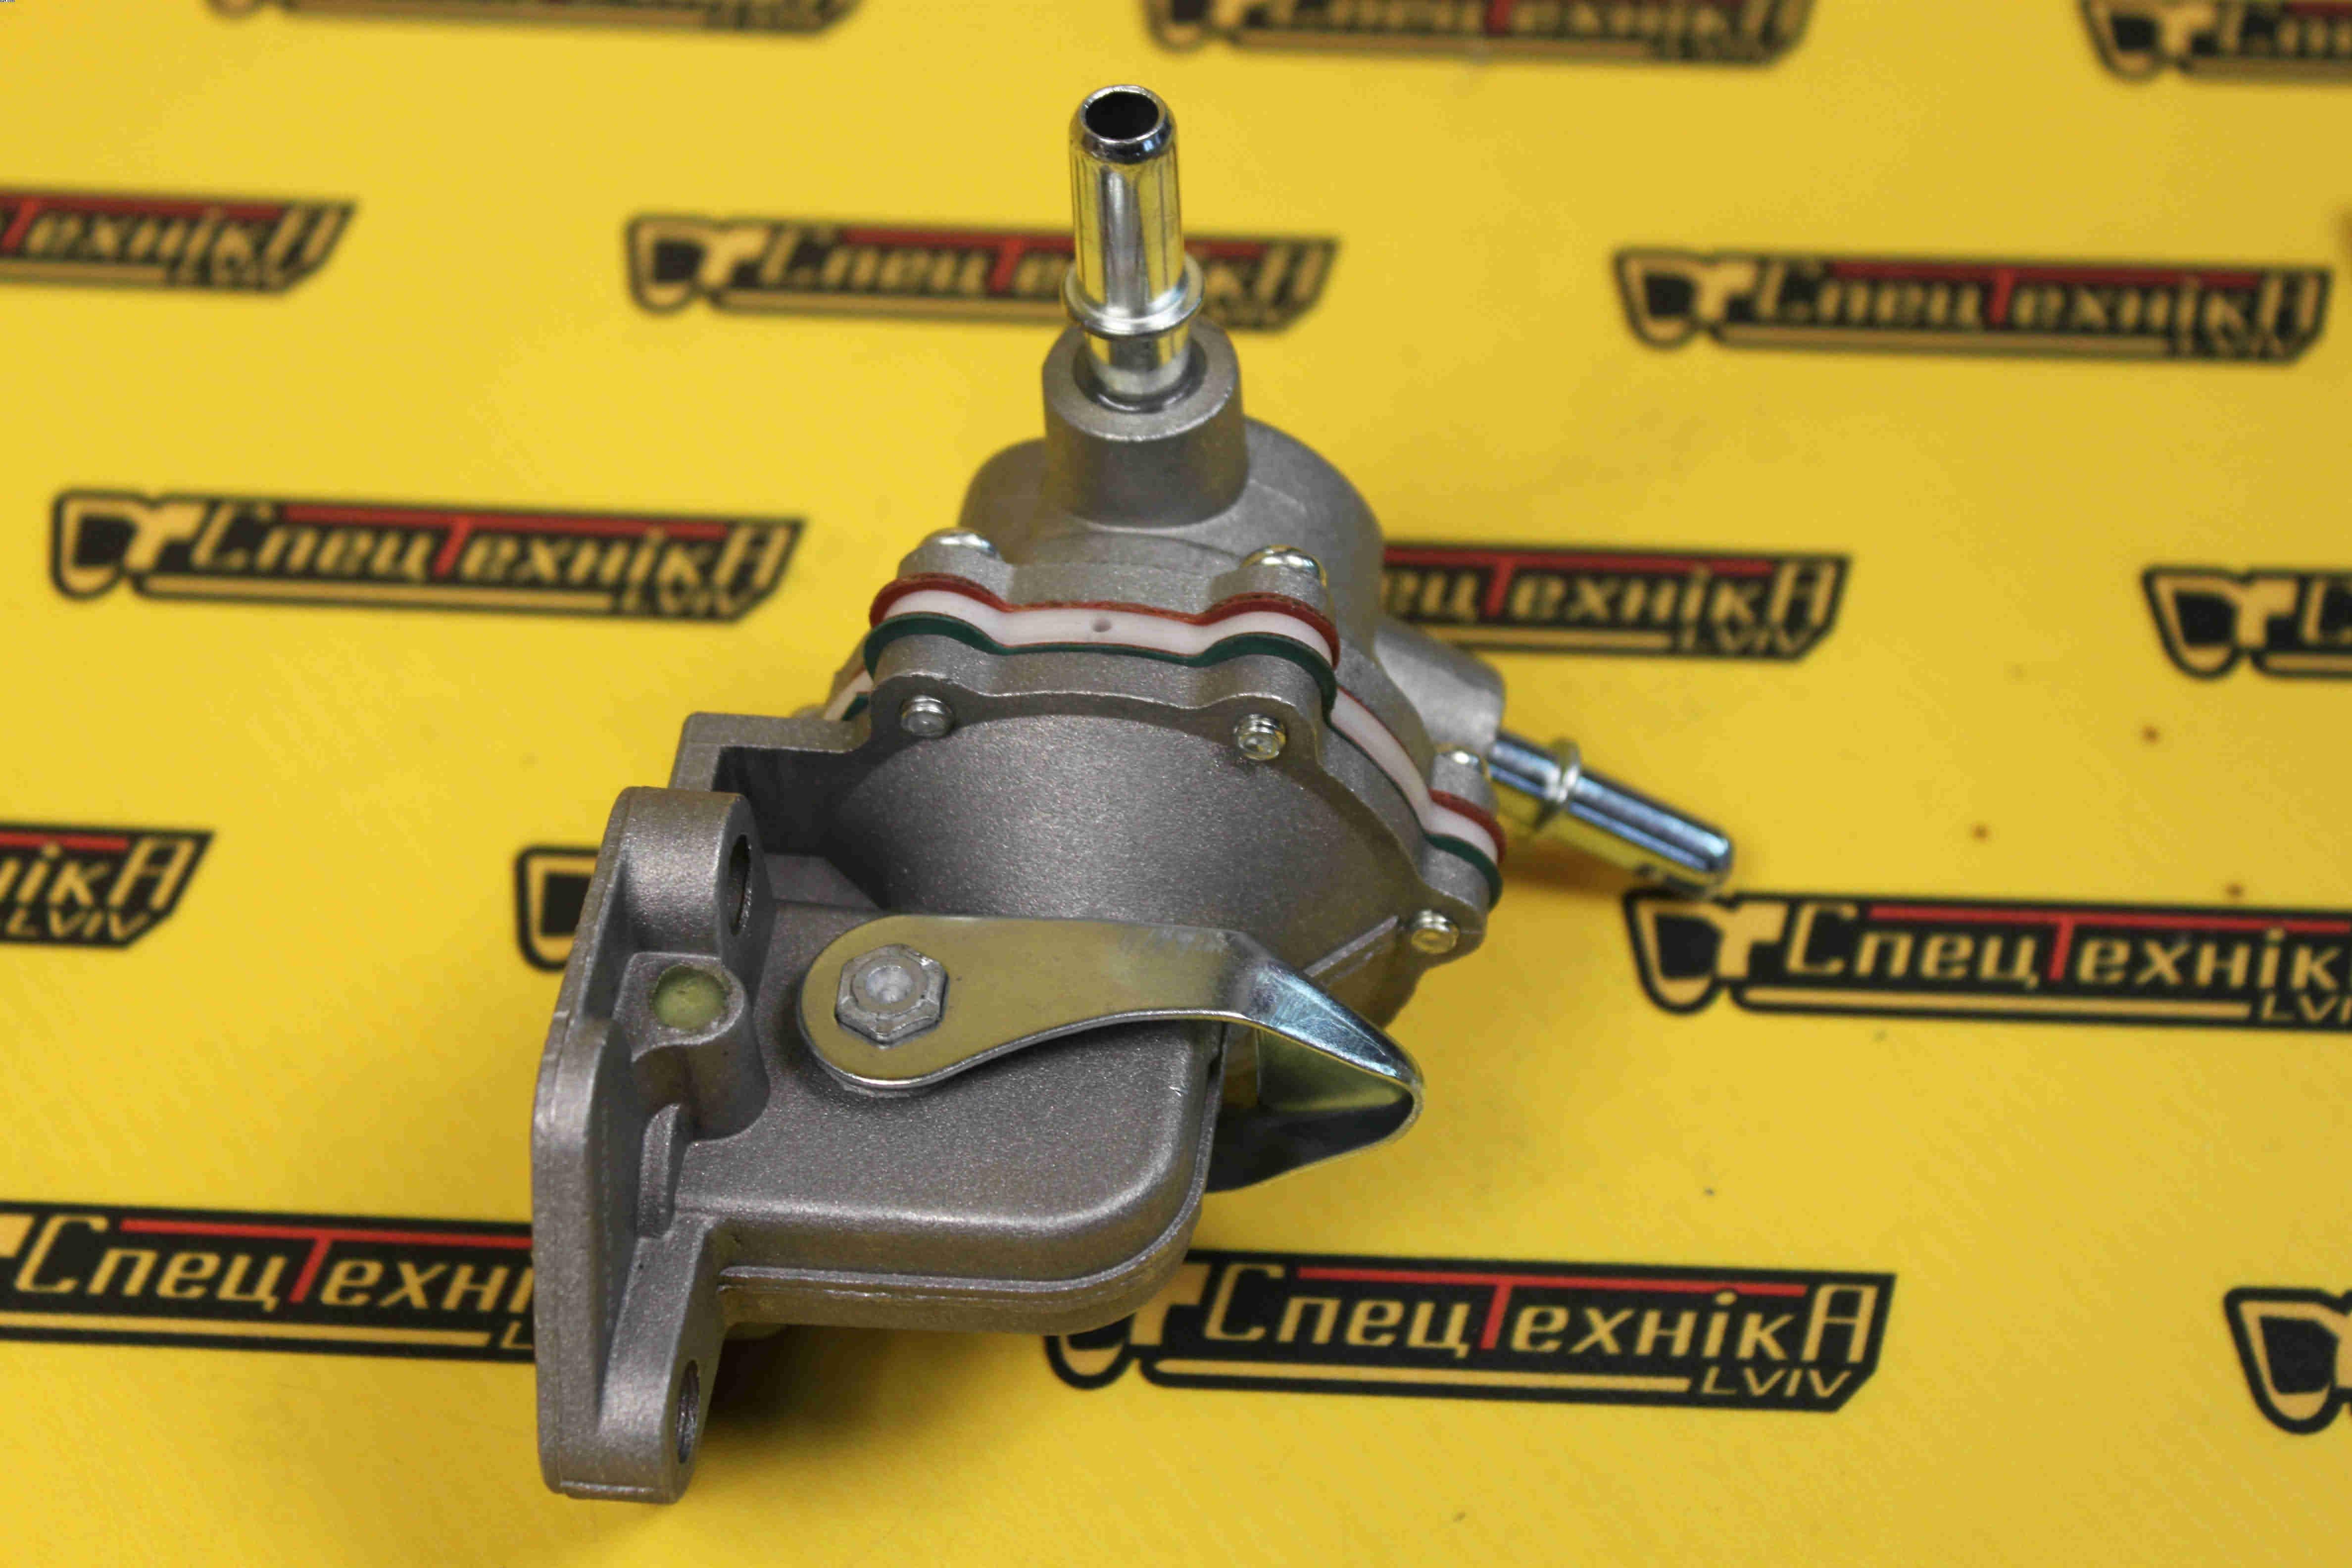 Насос топливный ручной подкачки топлива JCB 3CX, 4CX DieselMax (320/07201, 320-07201, 32007201)